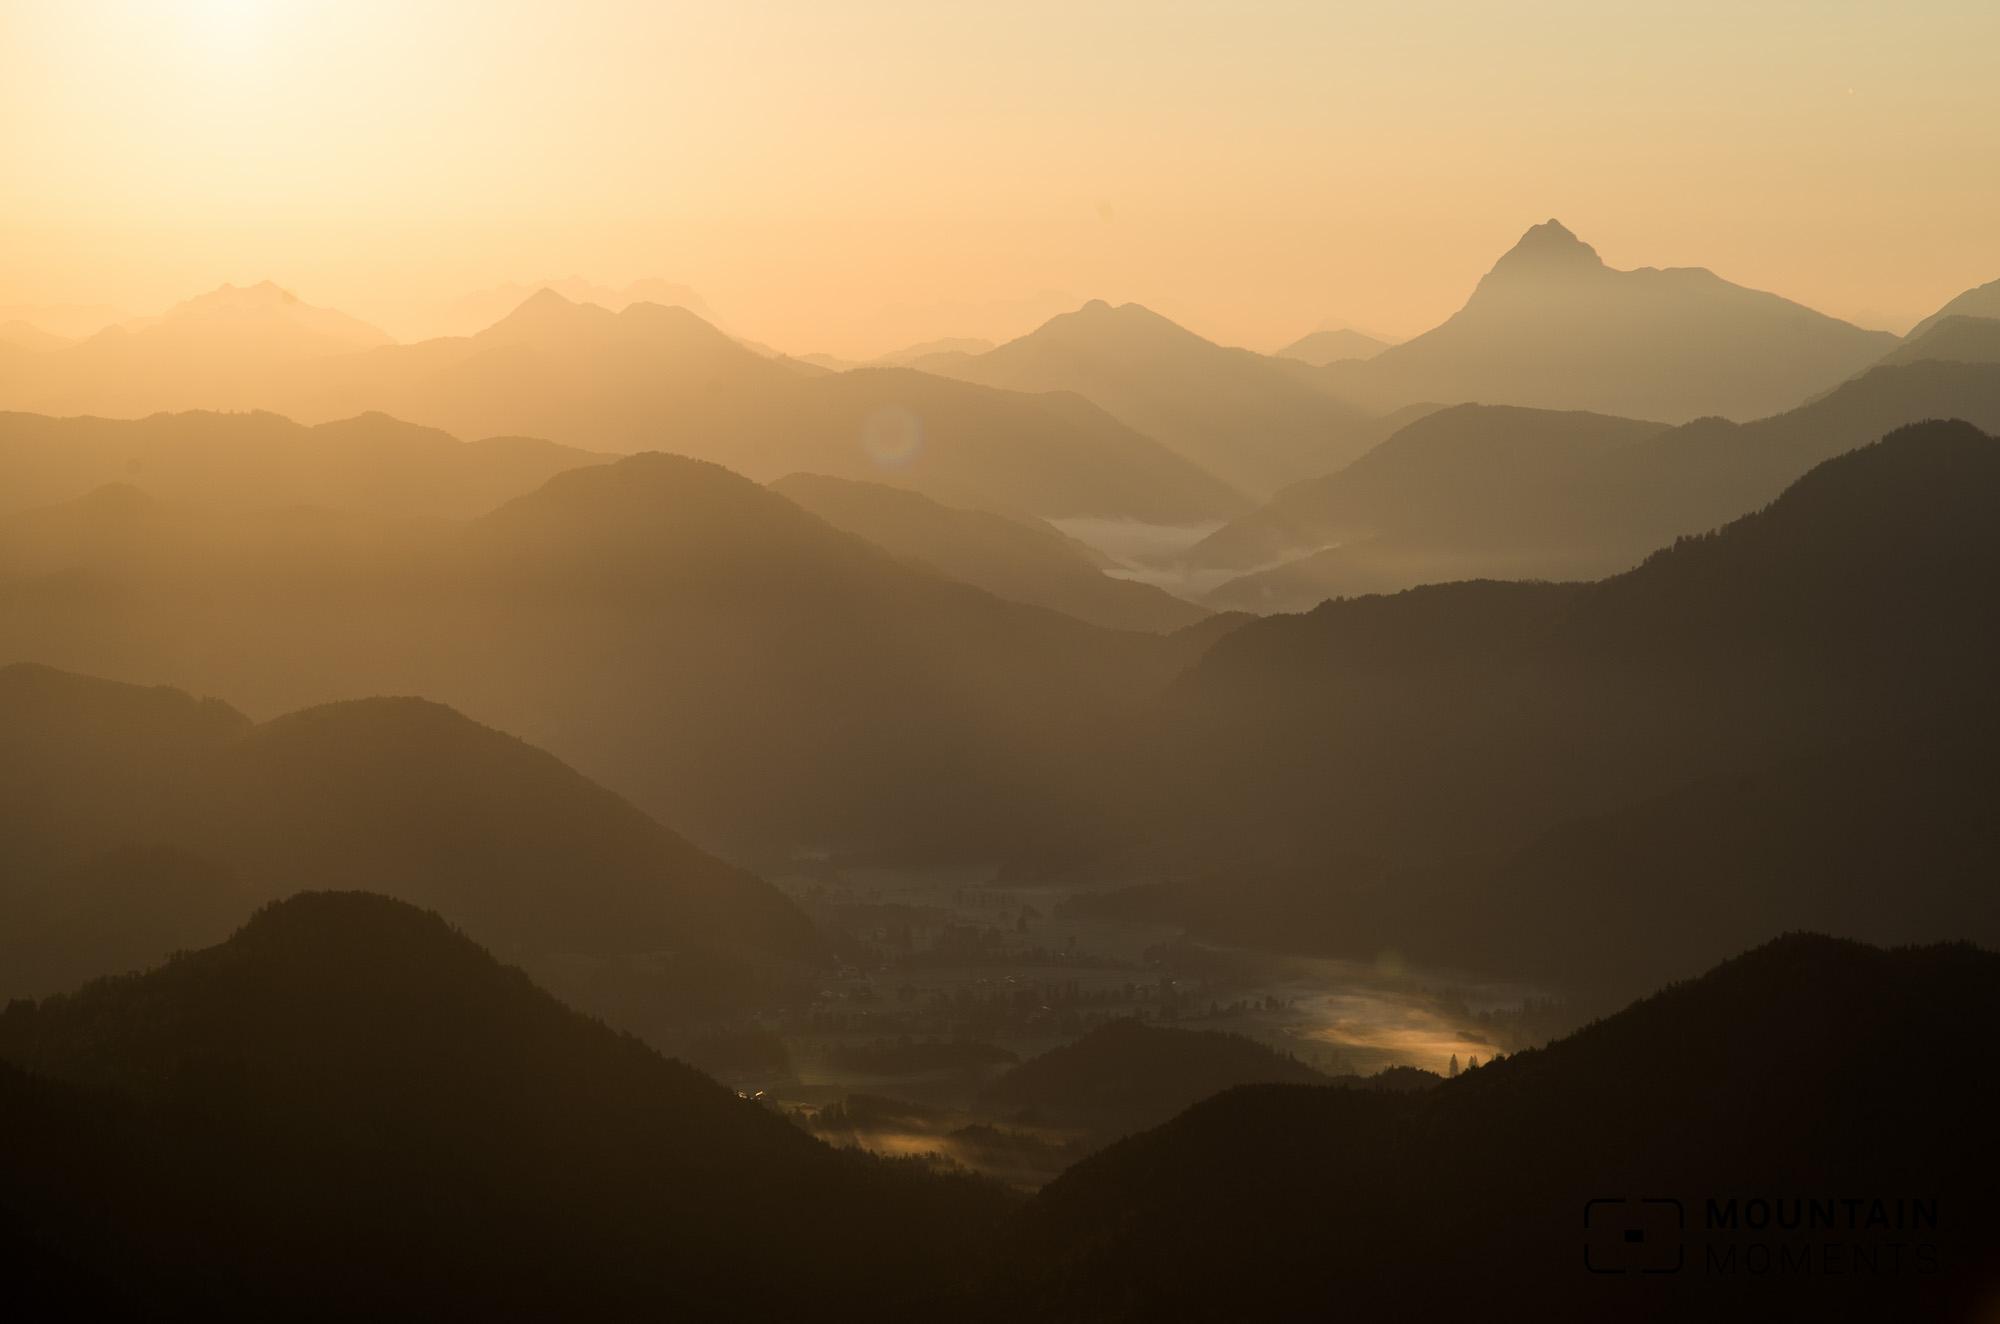 herzogstand, sonnenaufgang herzogstand, sonnenaufgang walchensee, sunrise walchen lake, sunrise alps, sunrise bavaria, sunrise kochel, alpine lake, bavarian alps, bayerische alpen, münchner hausberge